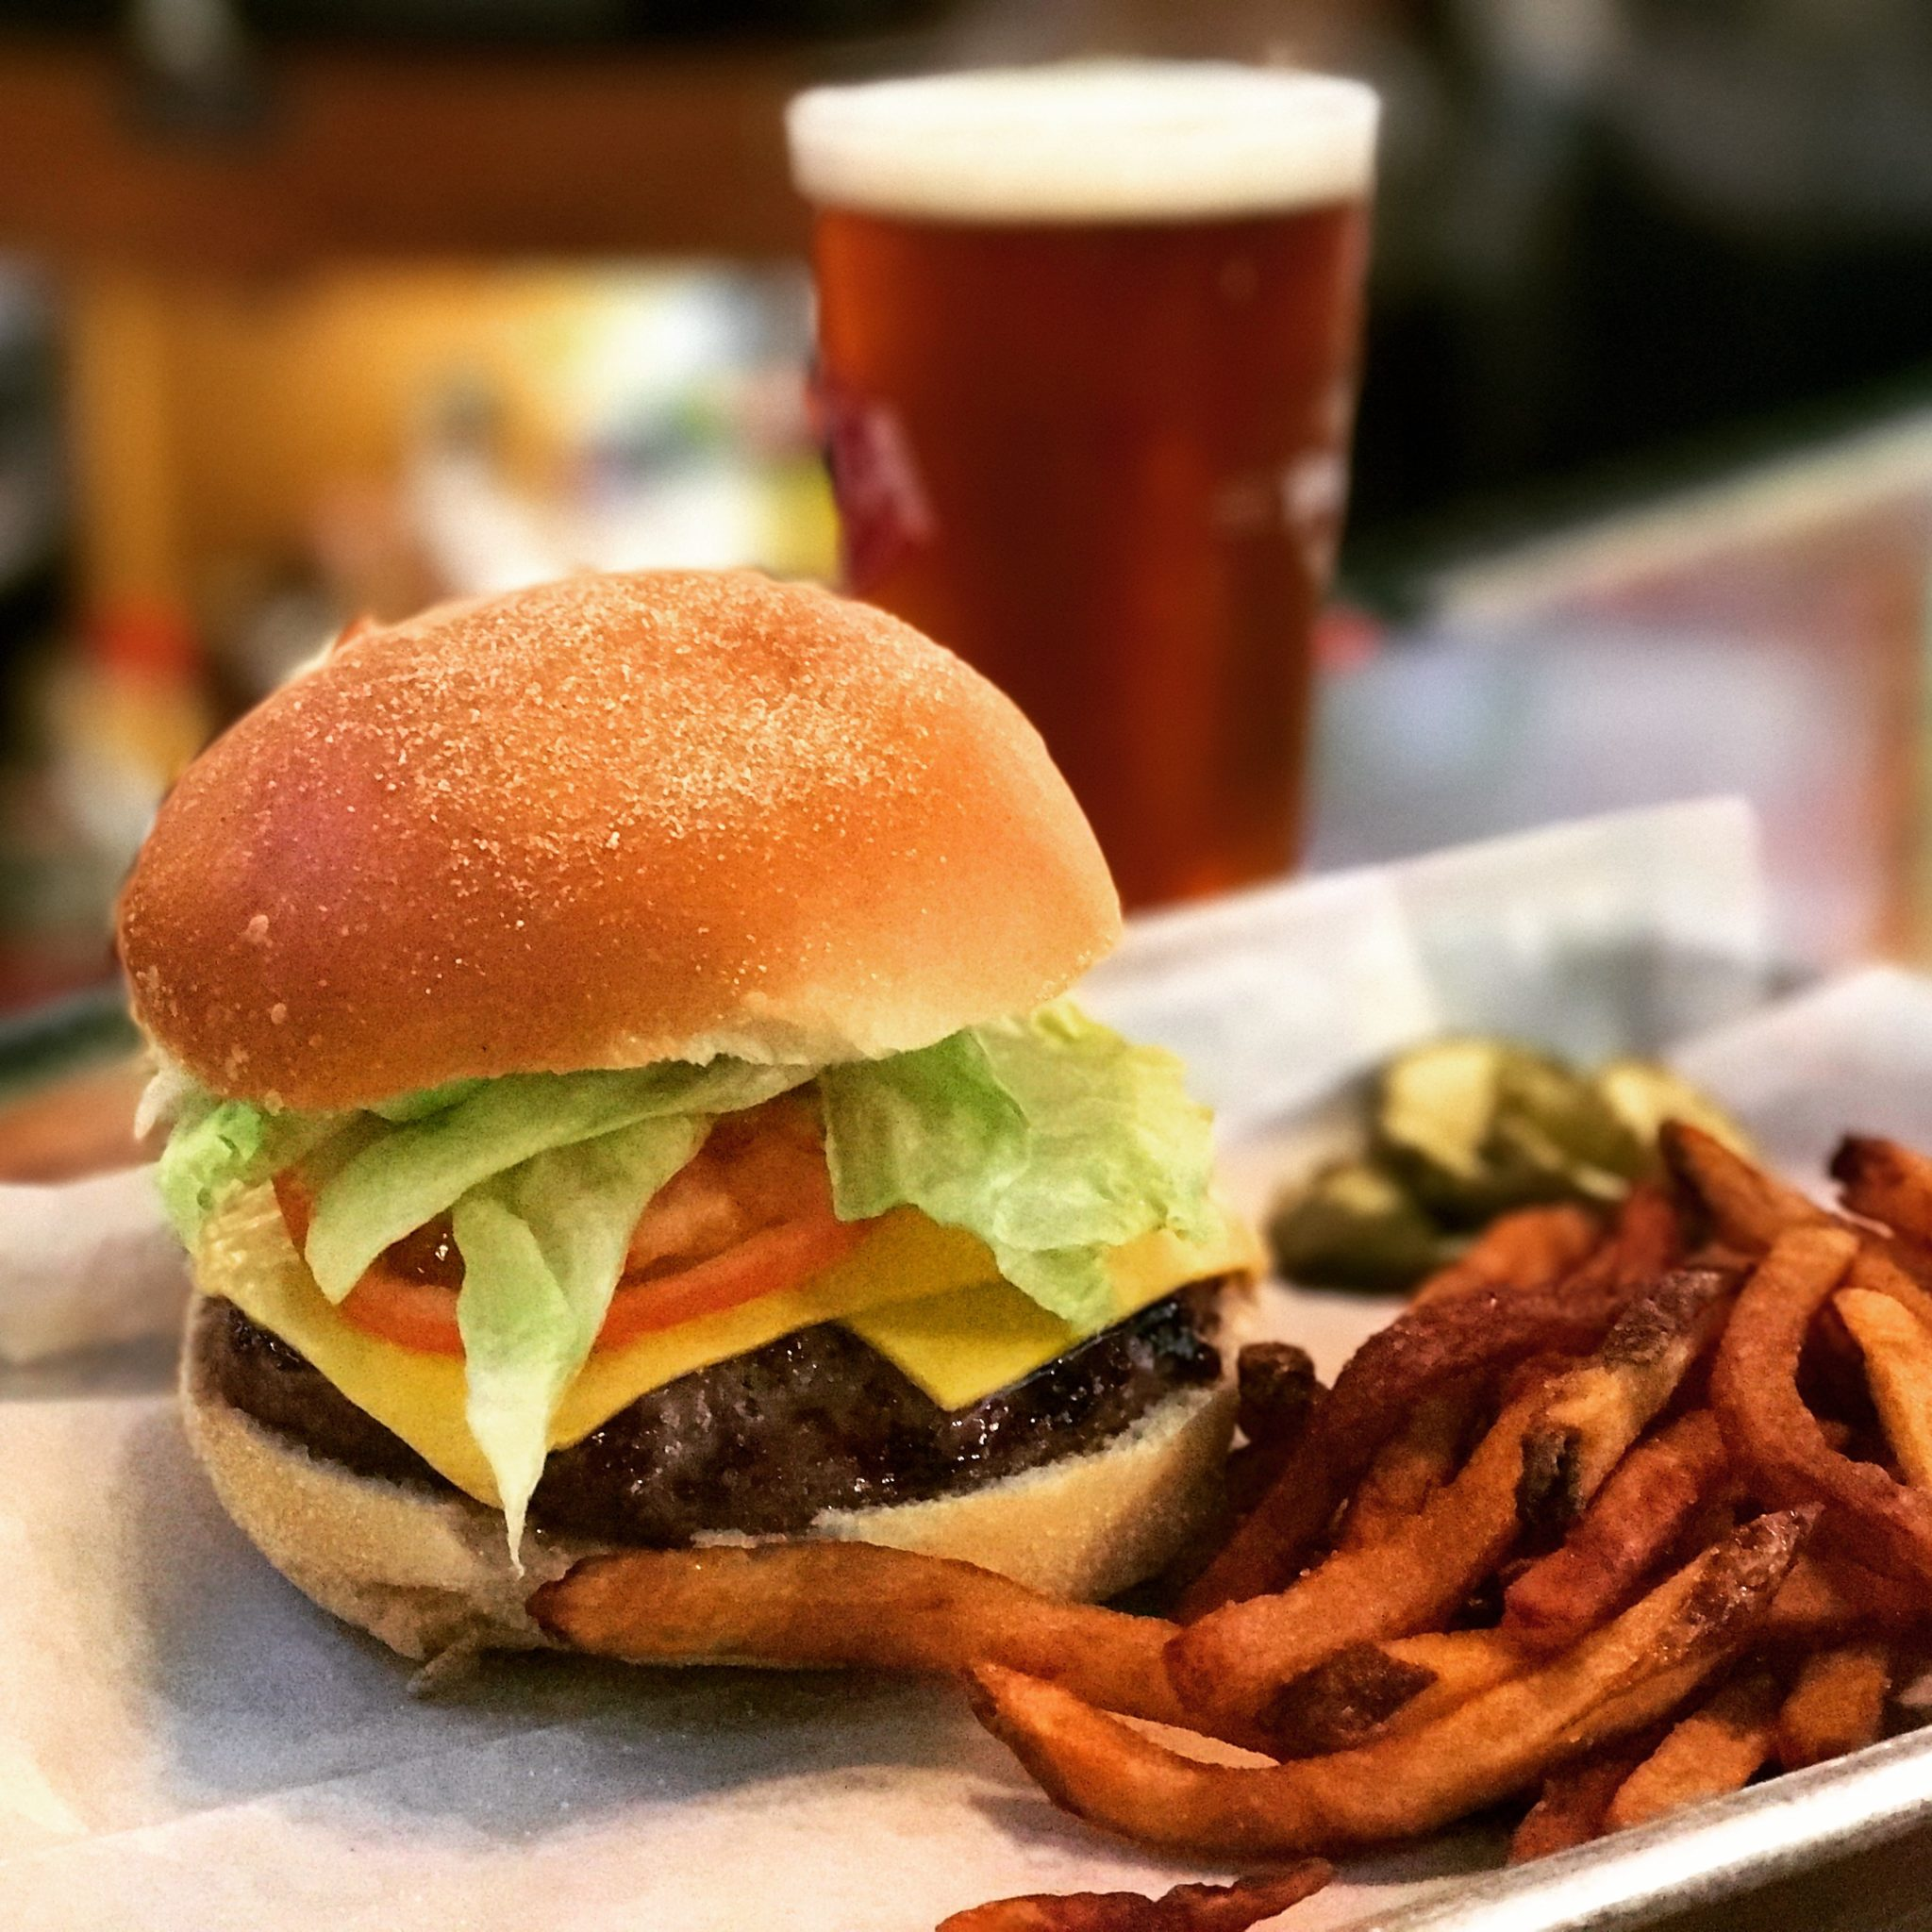 The Linwood Inn's award winning burger